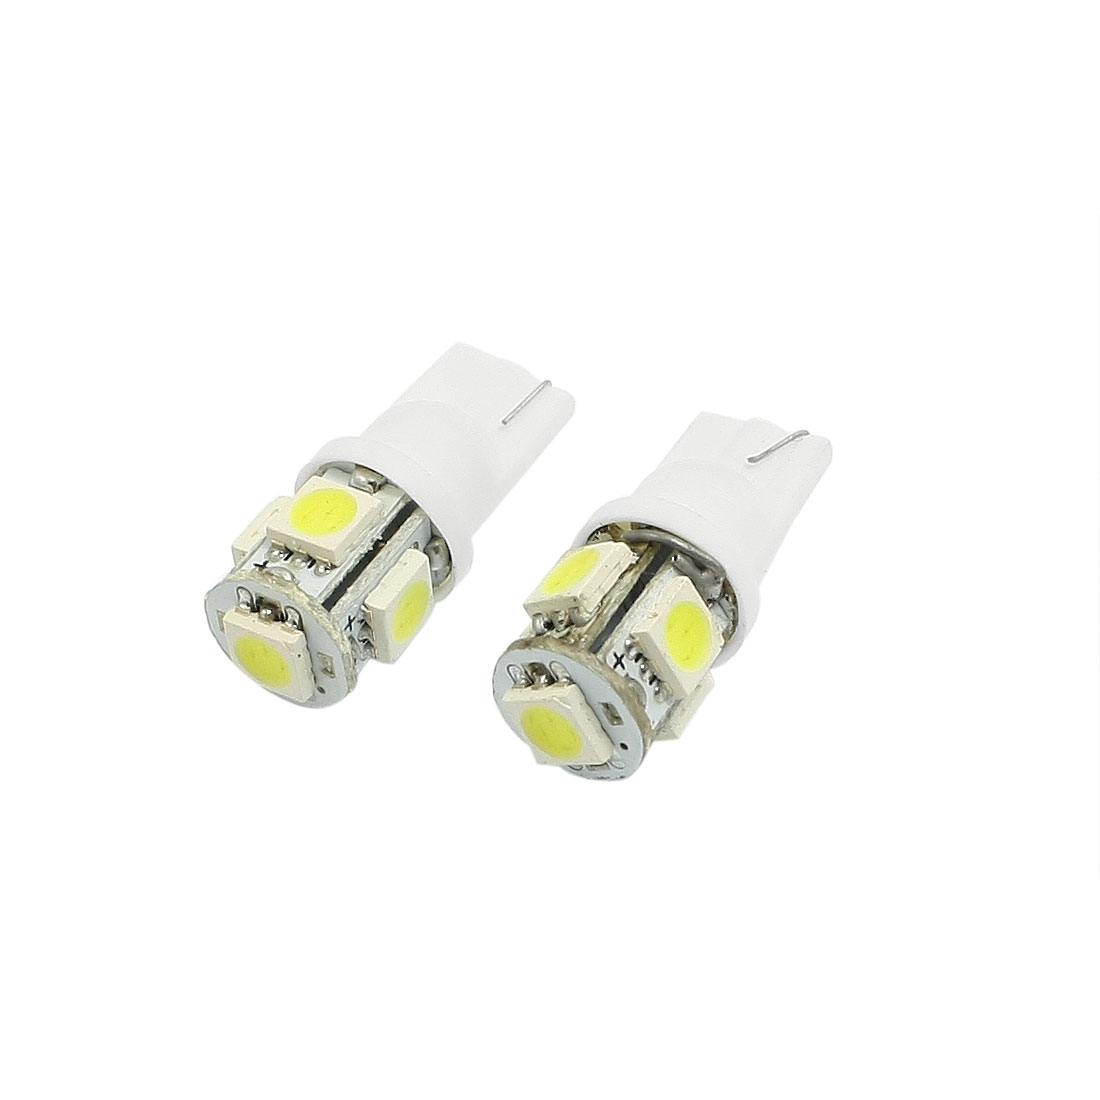 2 Pcs White Car T10 W5W White 5050 SMD 5 LED Bulb License Plate Light Lamp